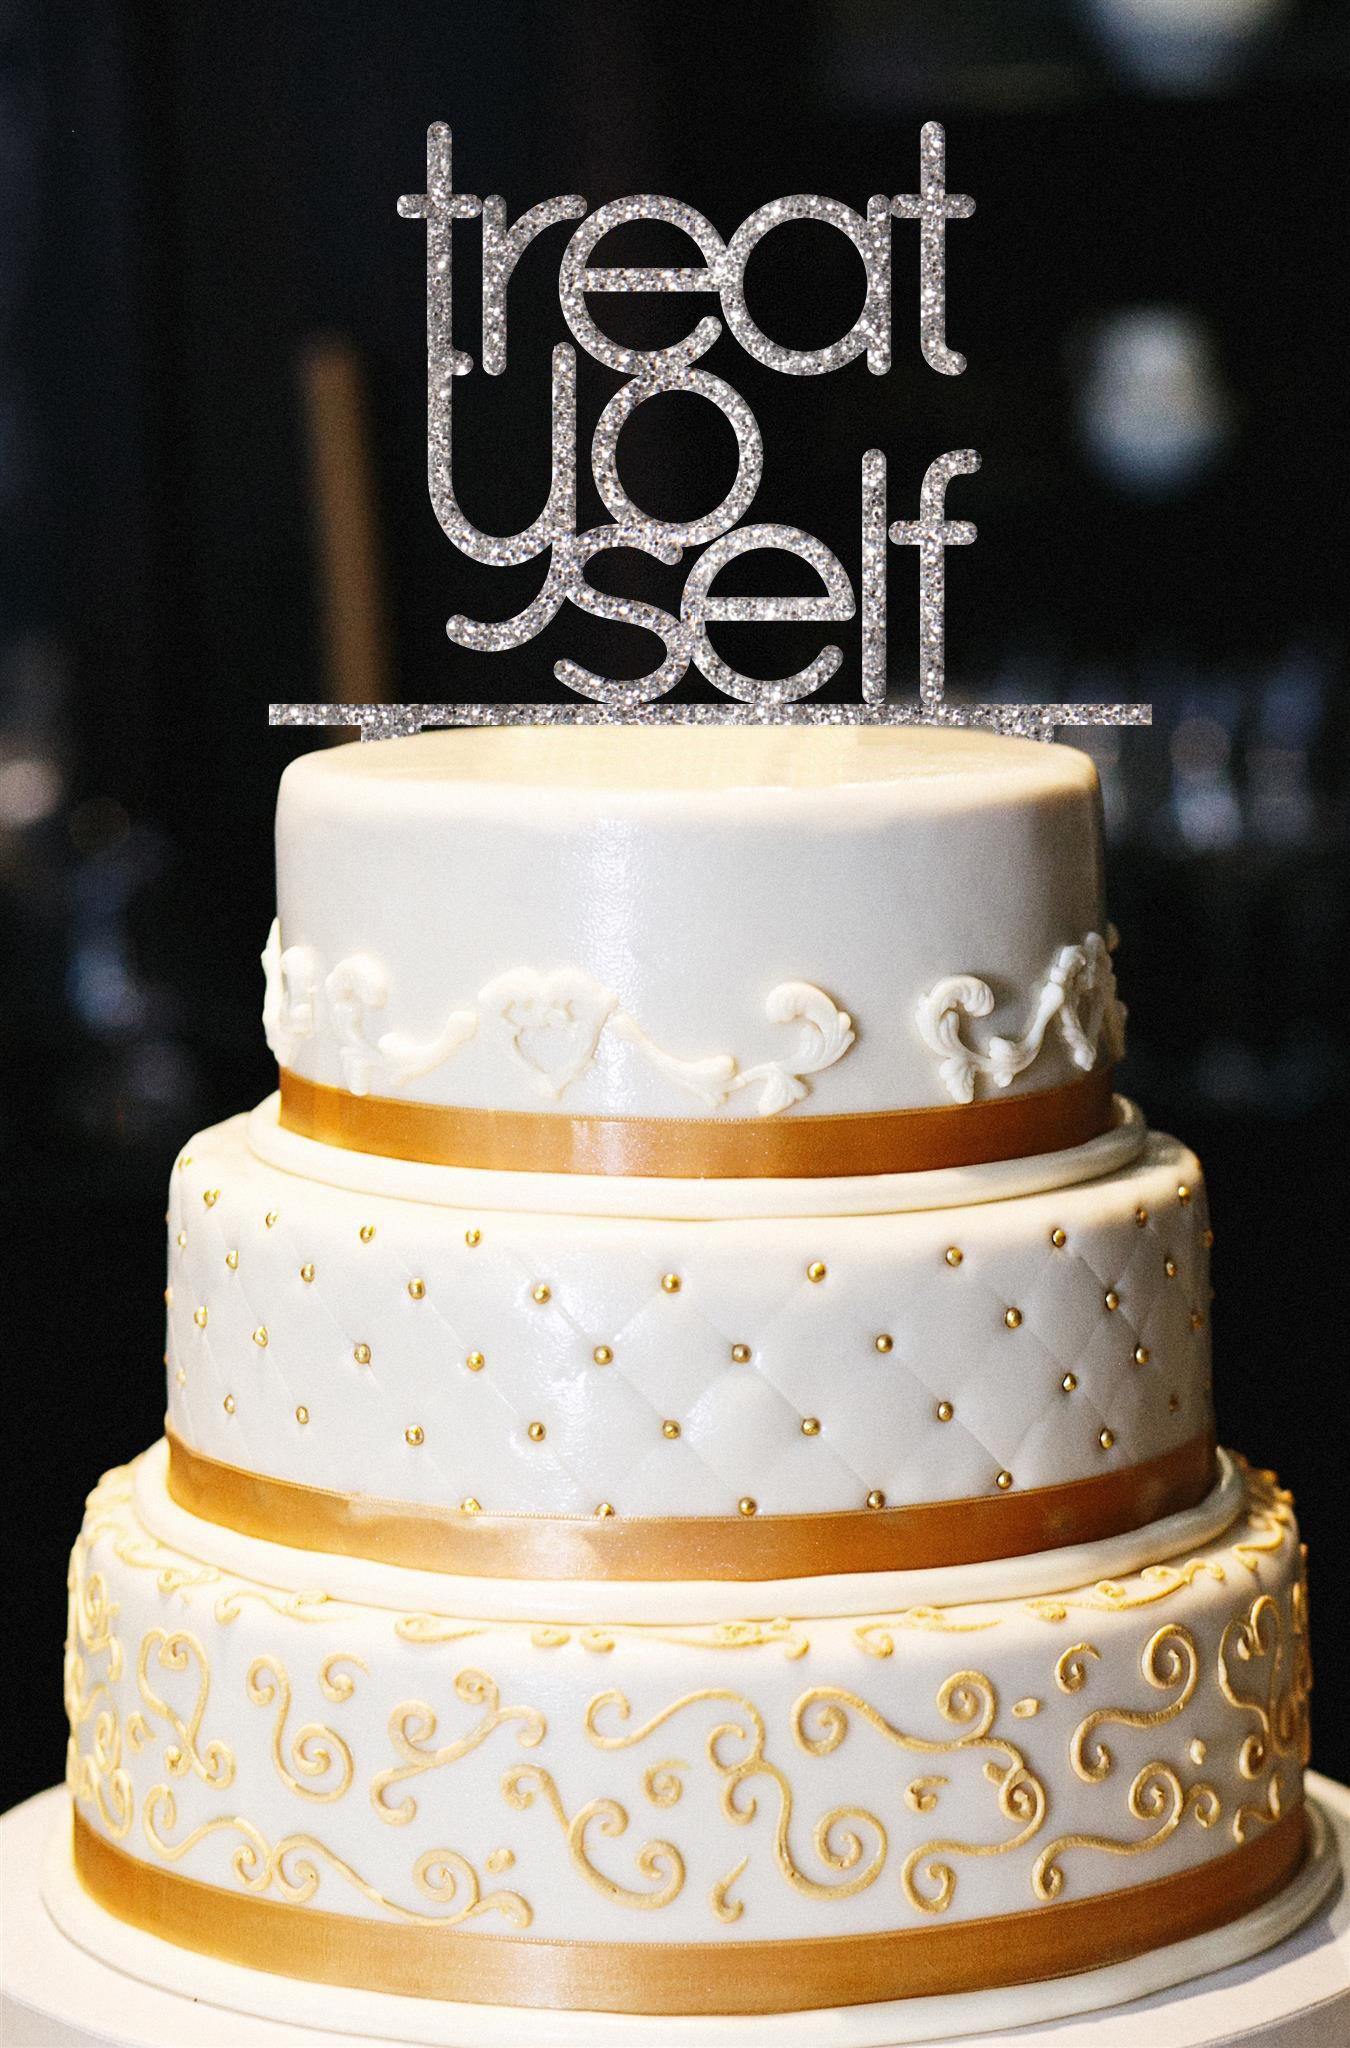 Treat Yo Self Cake Topper, Glitter Birthday Cake Topper, Birthday Party Cake Topper, Glitter Cake Topper, Gold Cake Topper (13'', Glitter Silver) by American Sign Letters